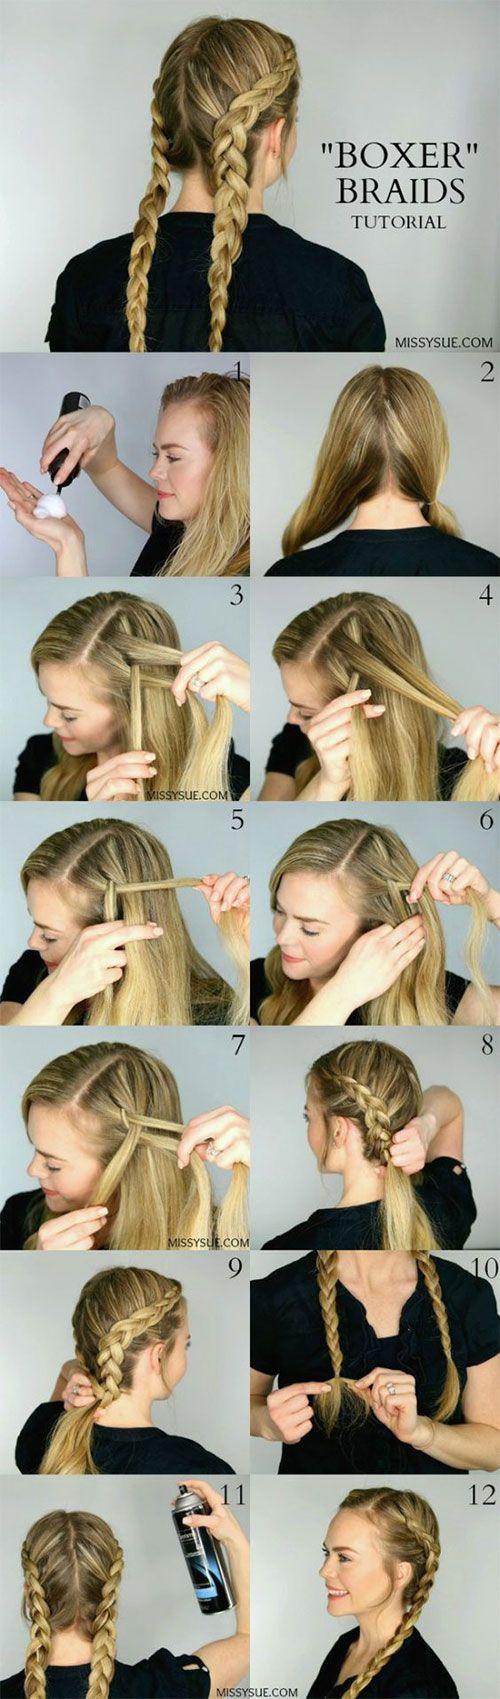 Step By Step Boxer Braid Tutorial For Beginners Learners 2016 Hair Styles Long Hair Styles Braided Hairstyles Tutorials